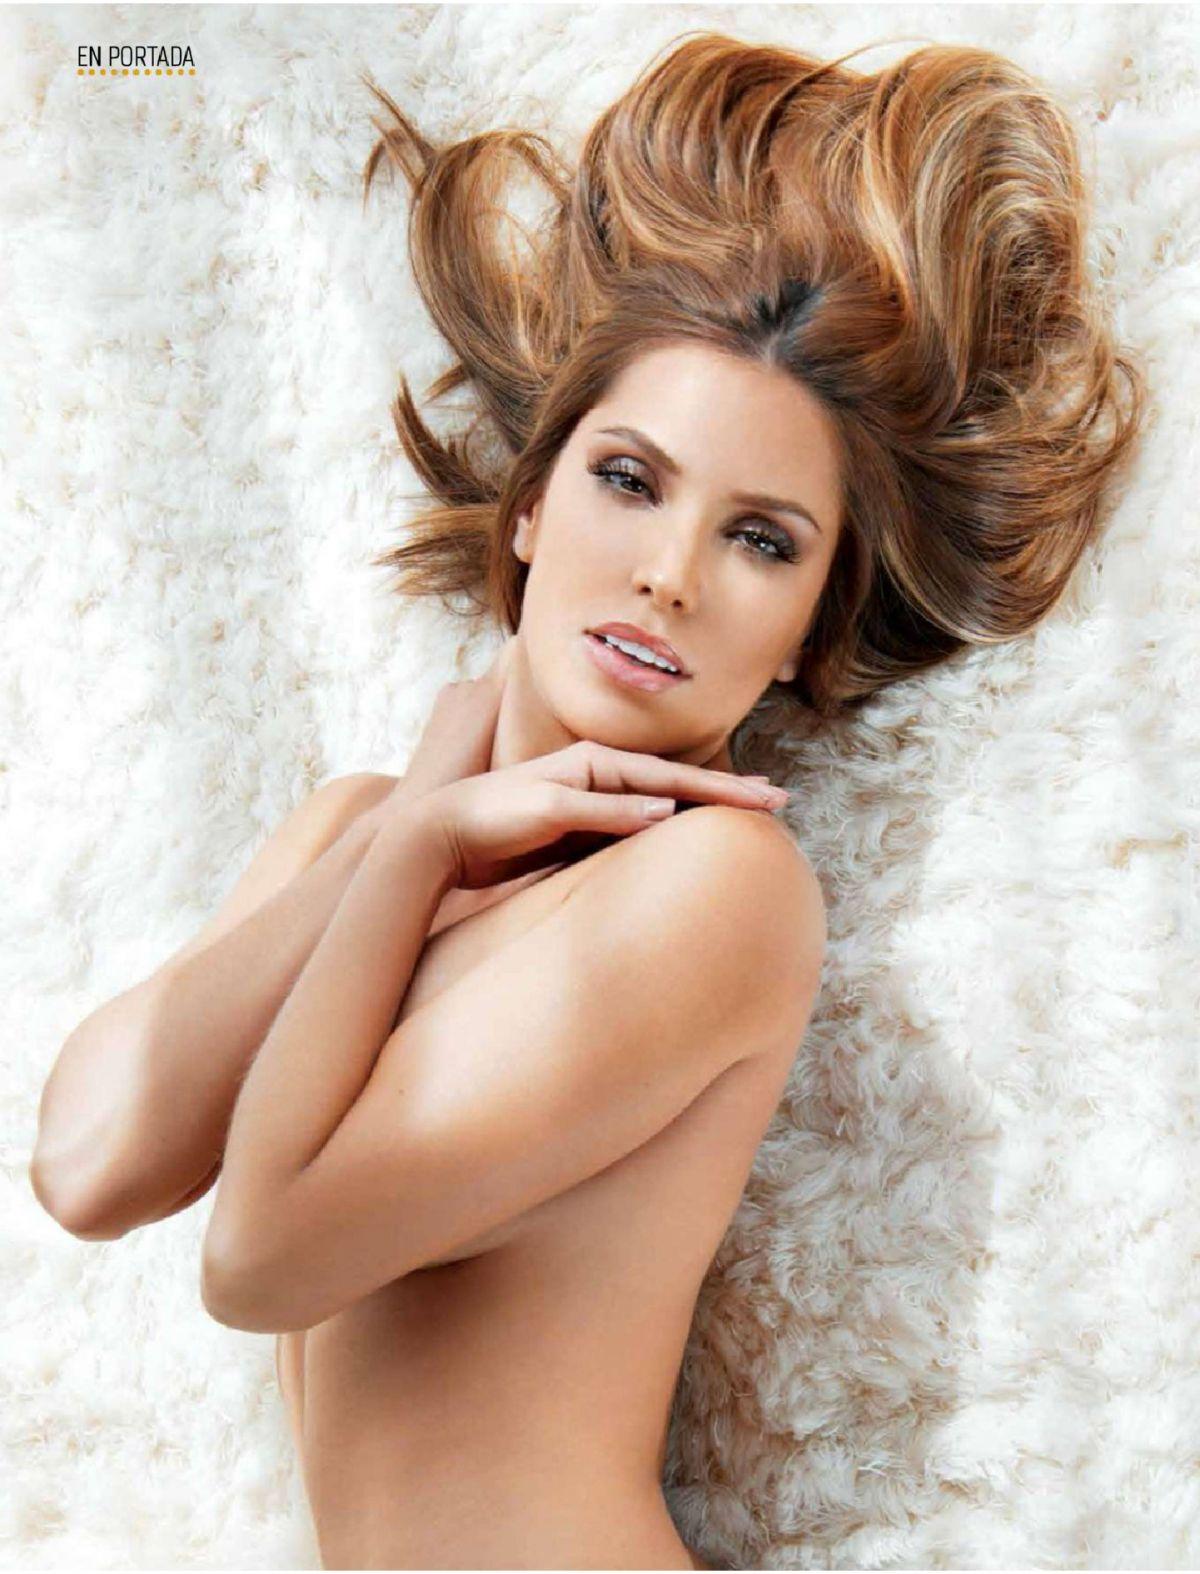 Andrea Escalona In Open Magazine Mexico January 2015 Issue Hawtcelebs